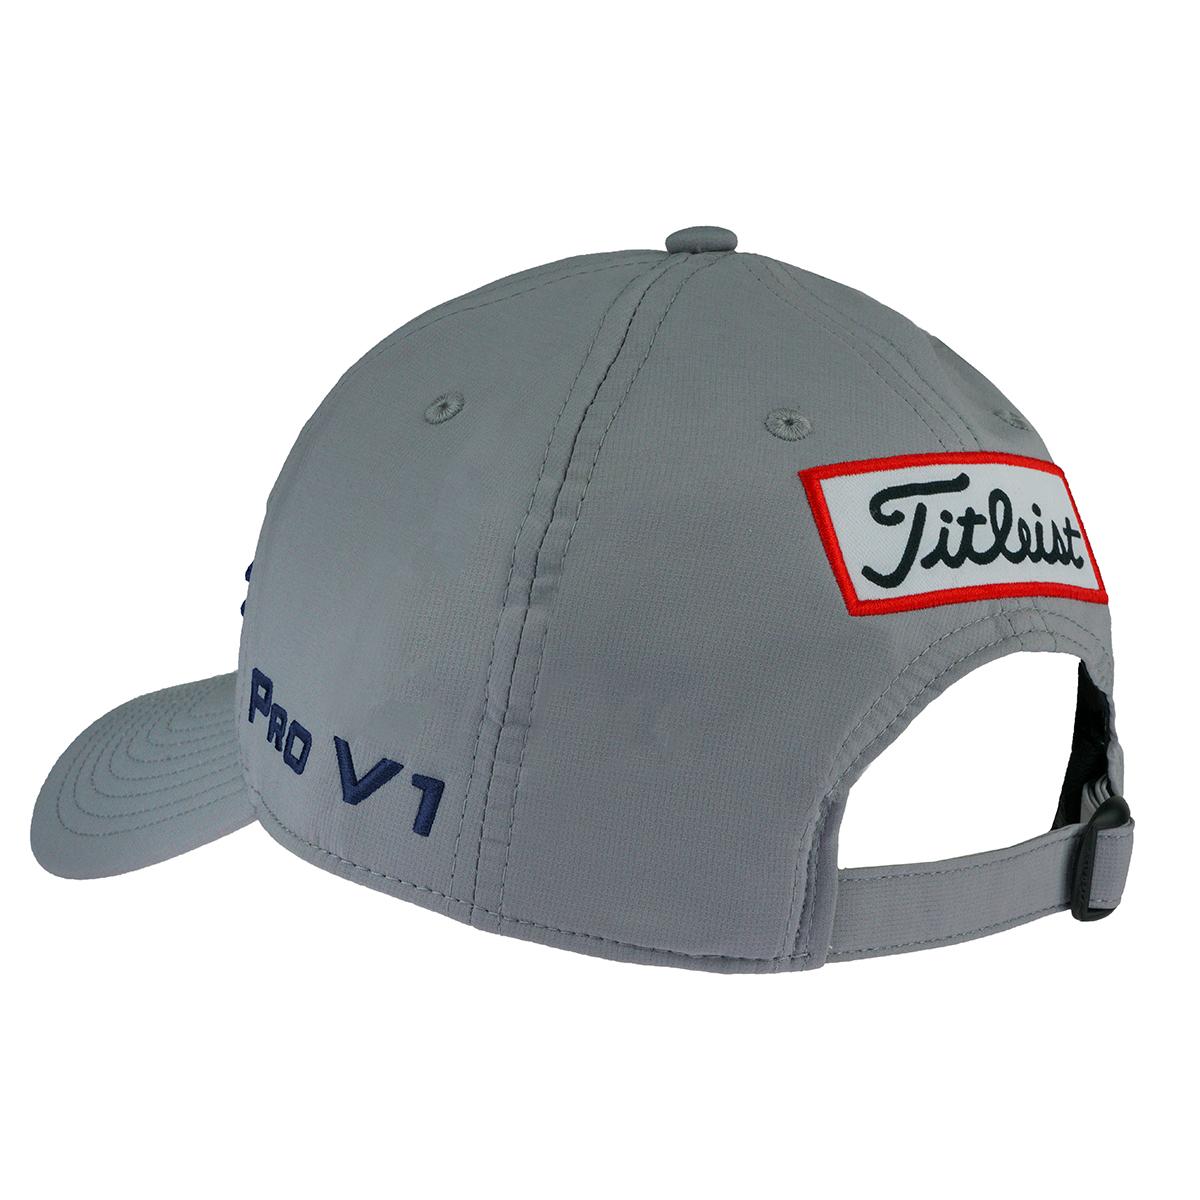 Titleist Golf 2018 Tour Performance Grey Collection Hat cap Color ... e91cb0b461a5